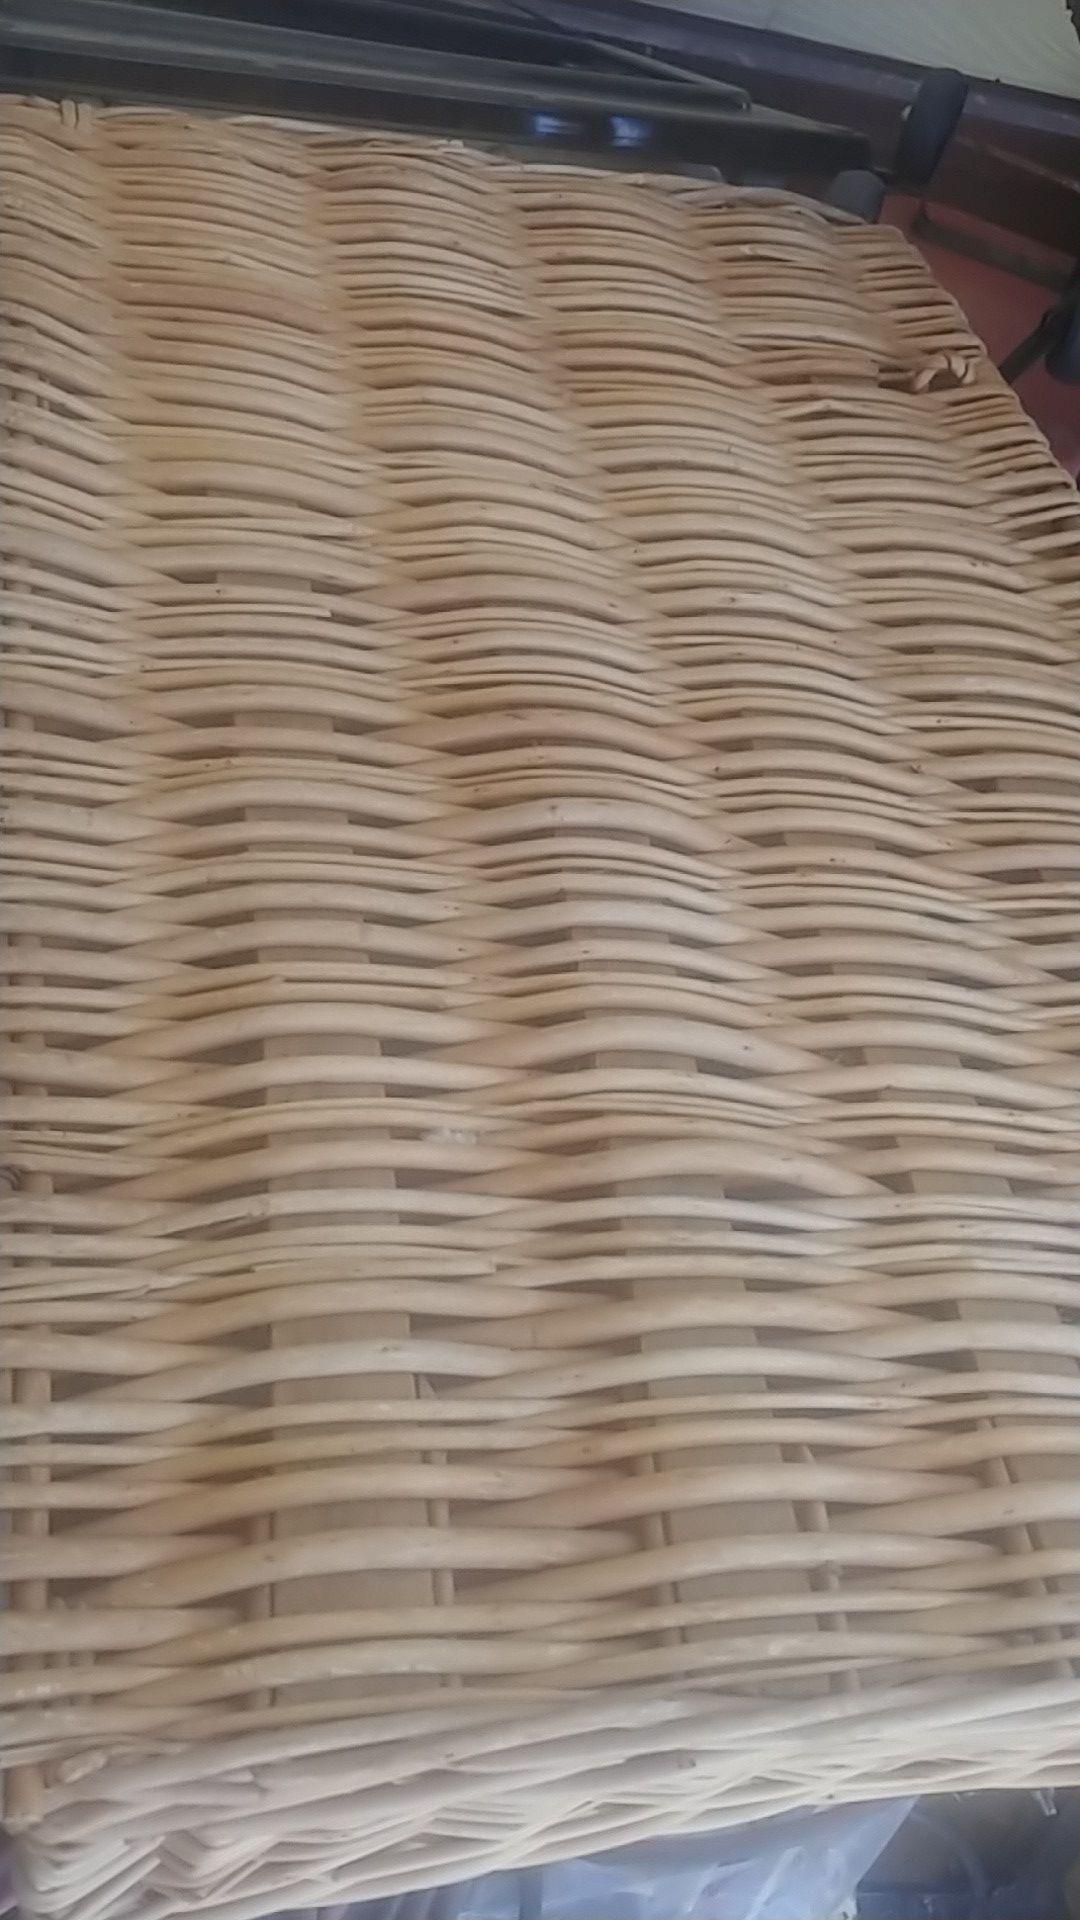 Basket long opens up